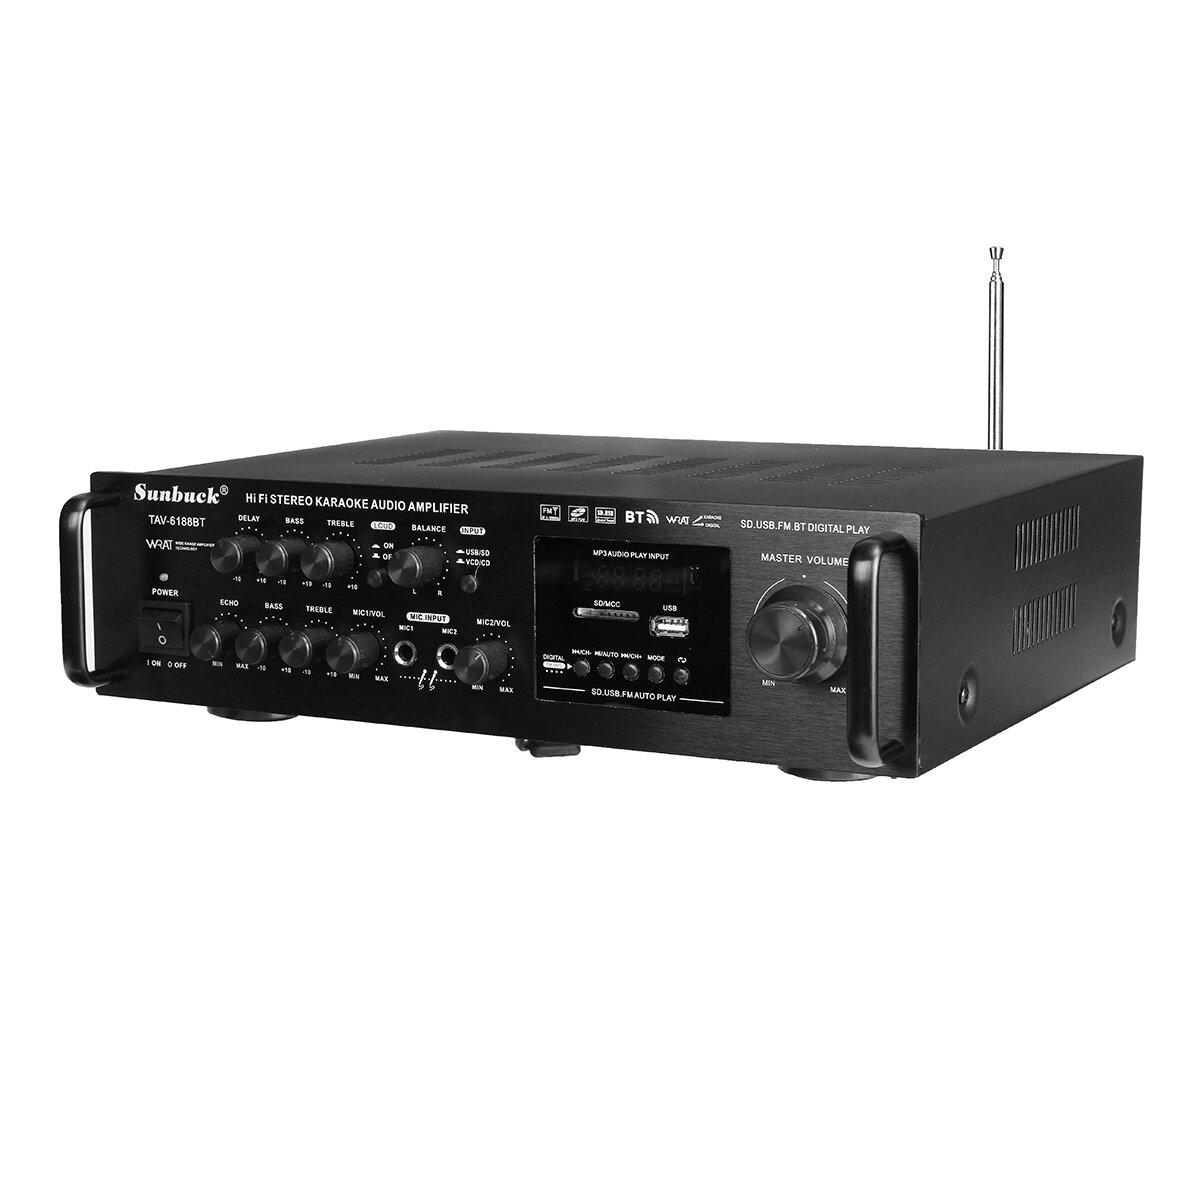 Sunbuck TAV-6188BT 2000W 4ohm Setero Bluetooth FM Karaoke Amplificatore RC Supporto 2 Microfono